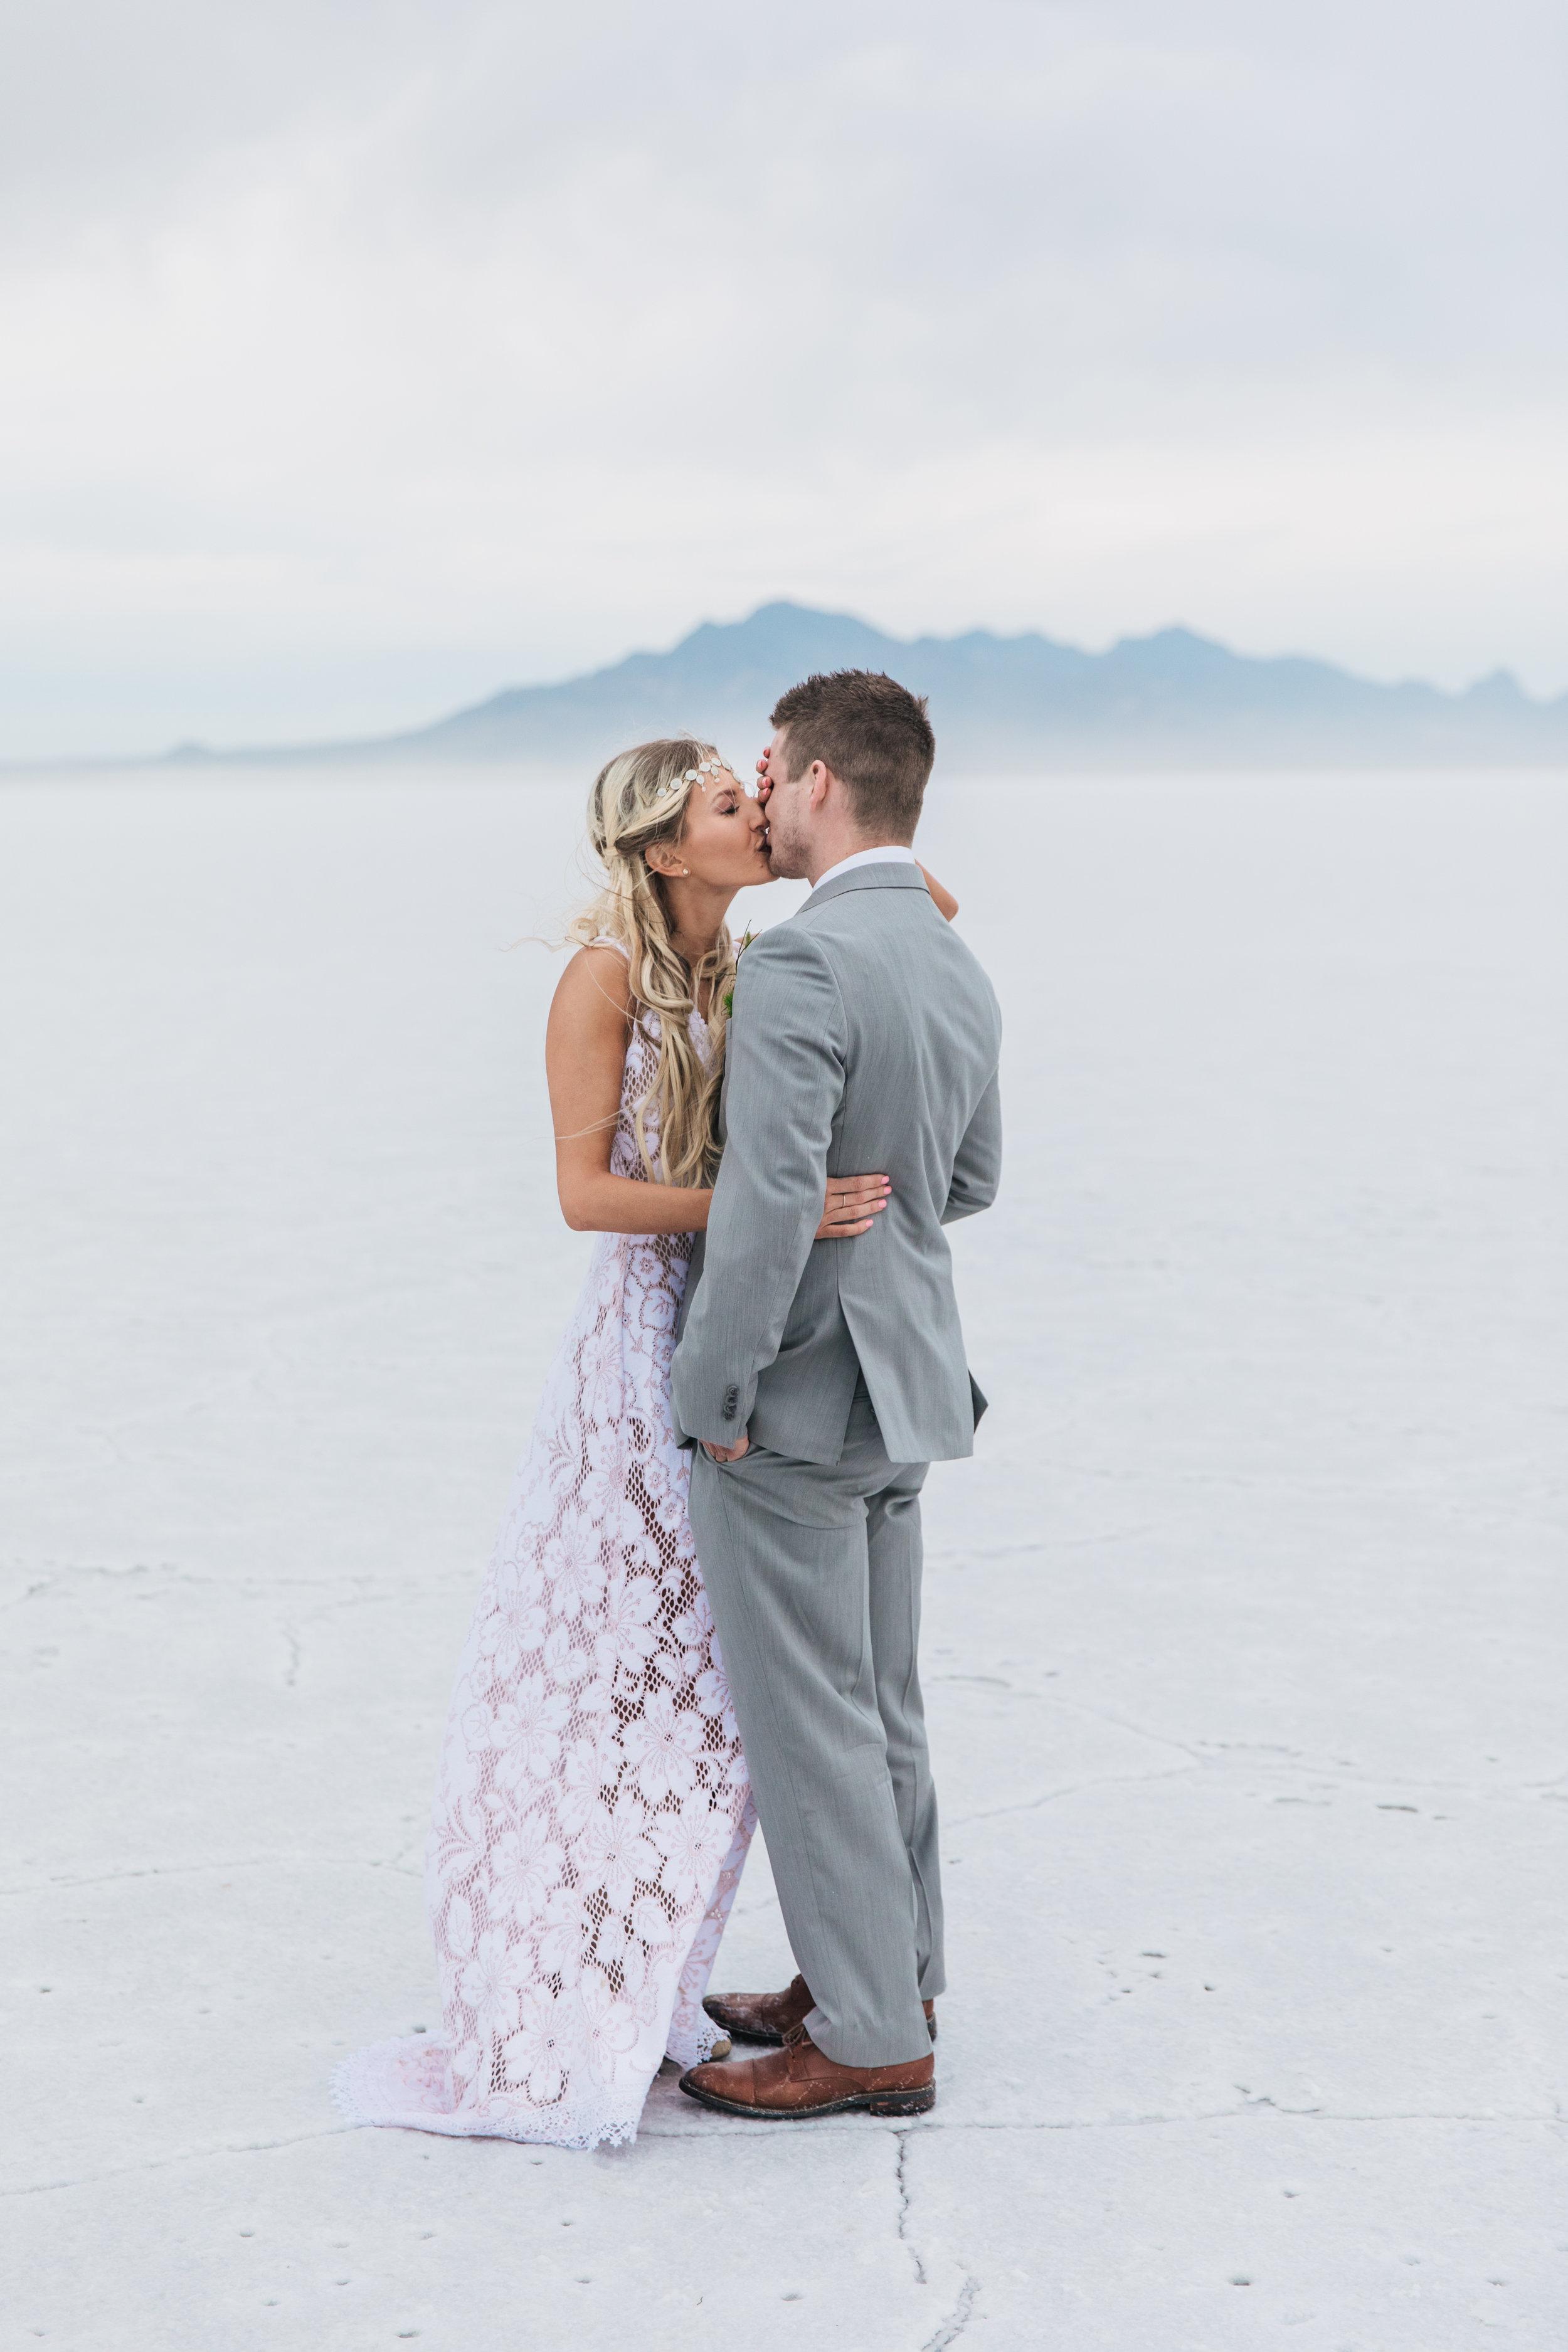 Fine art adventure wedding photographers Bonneville Salt Flats